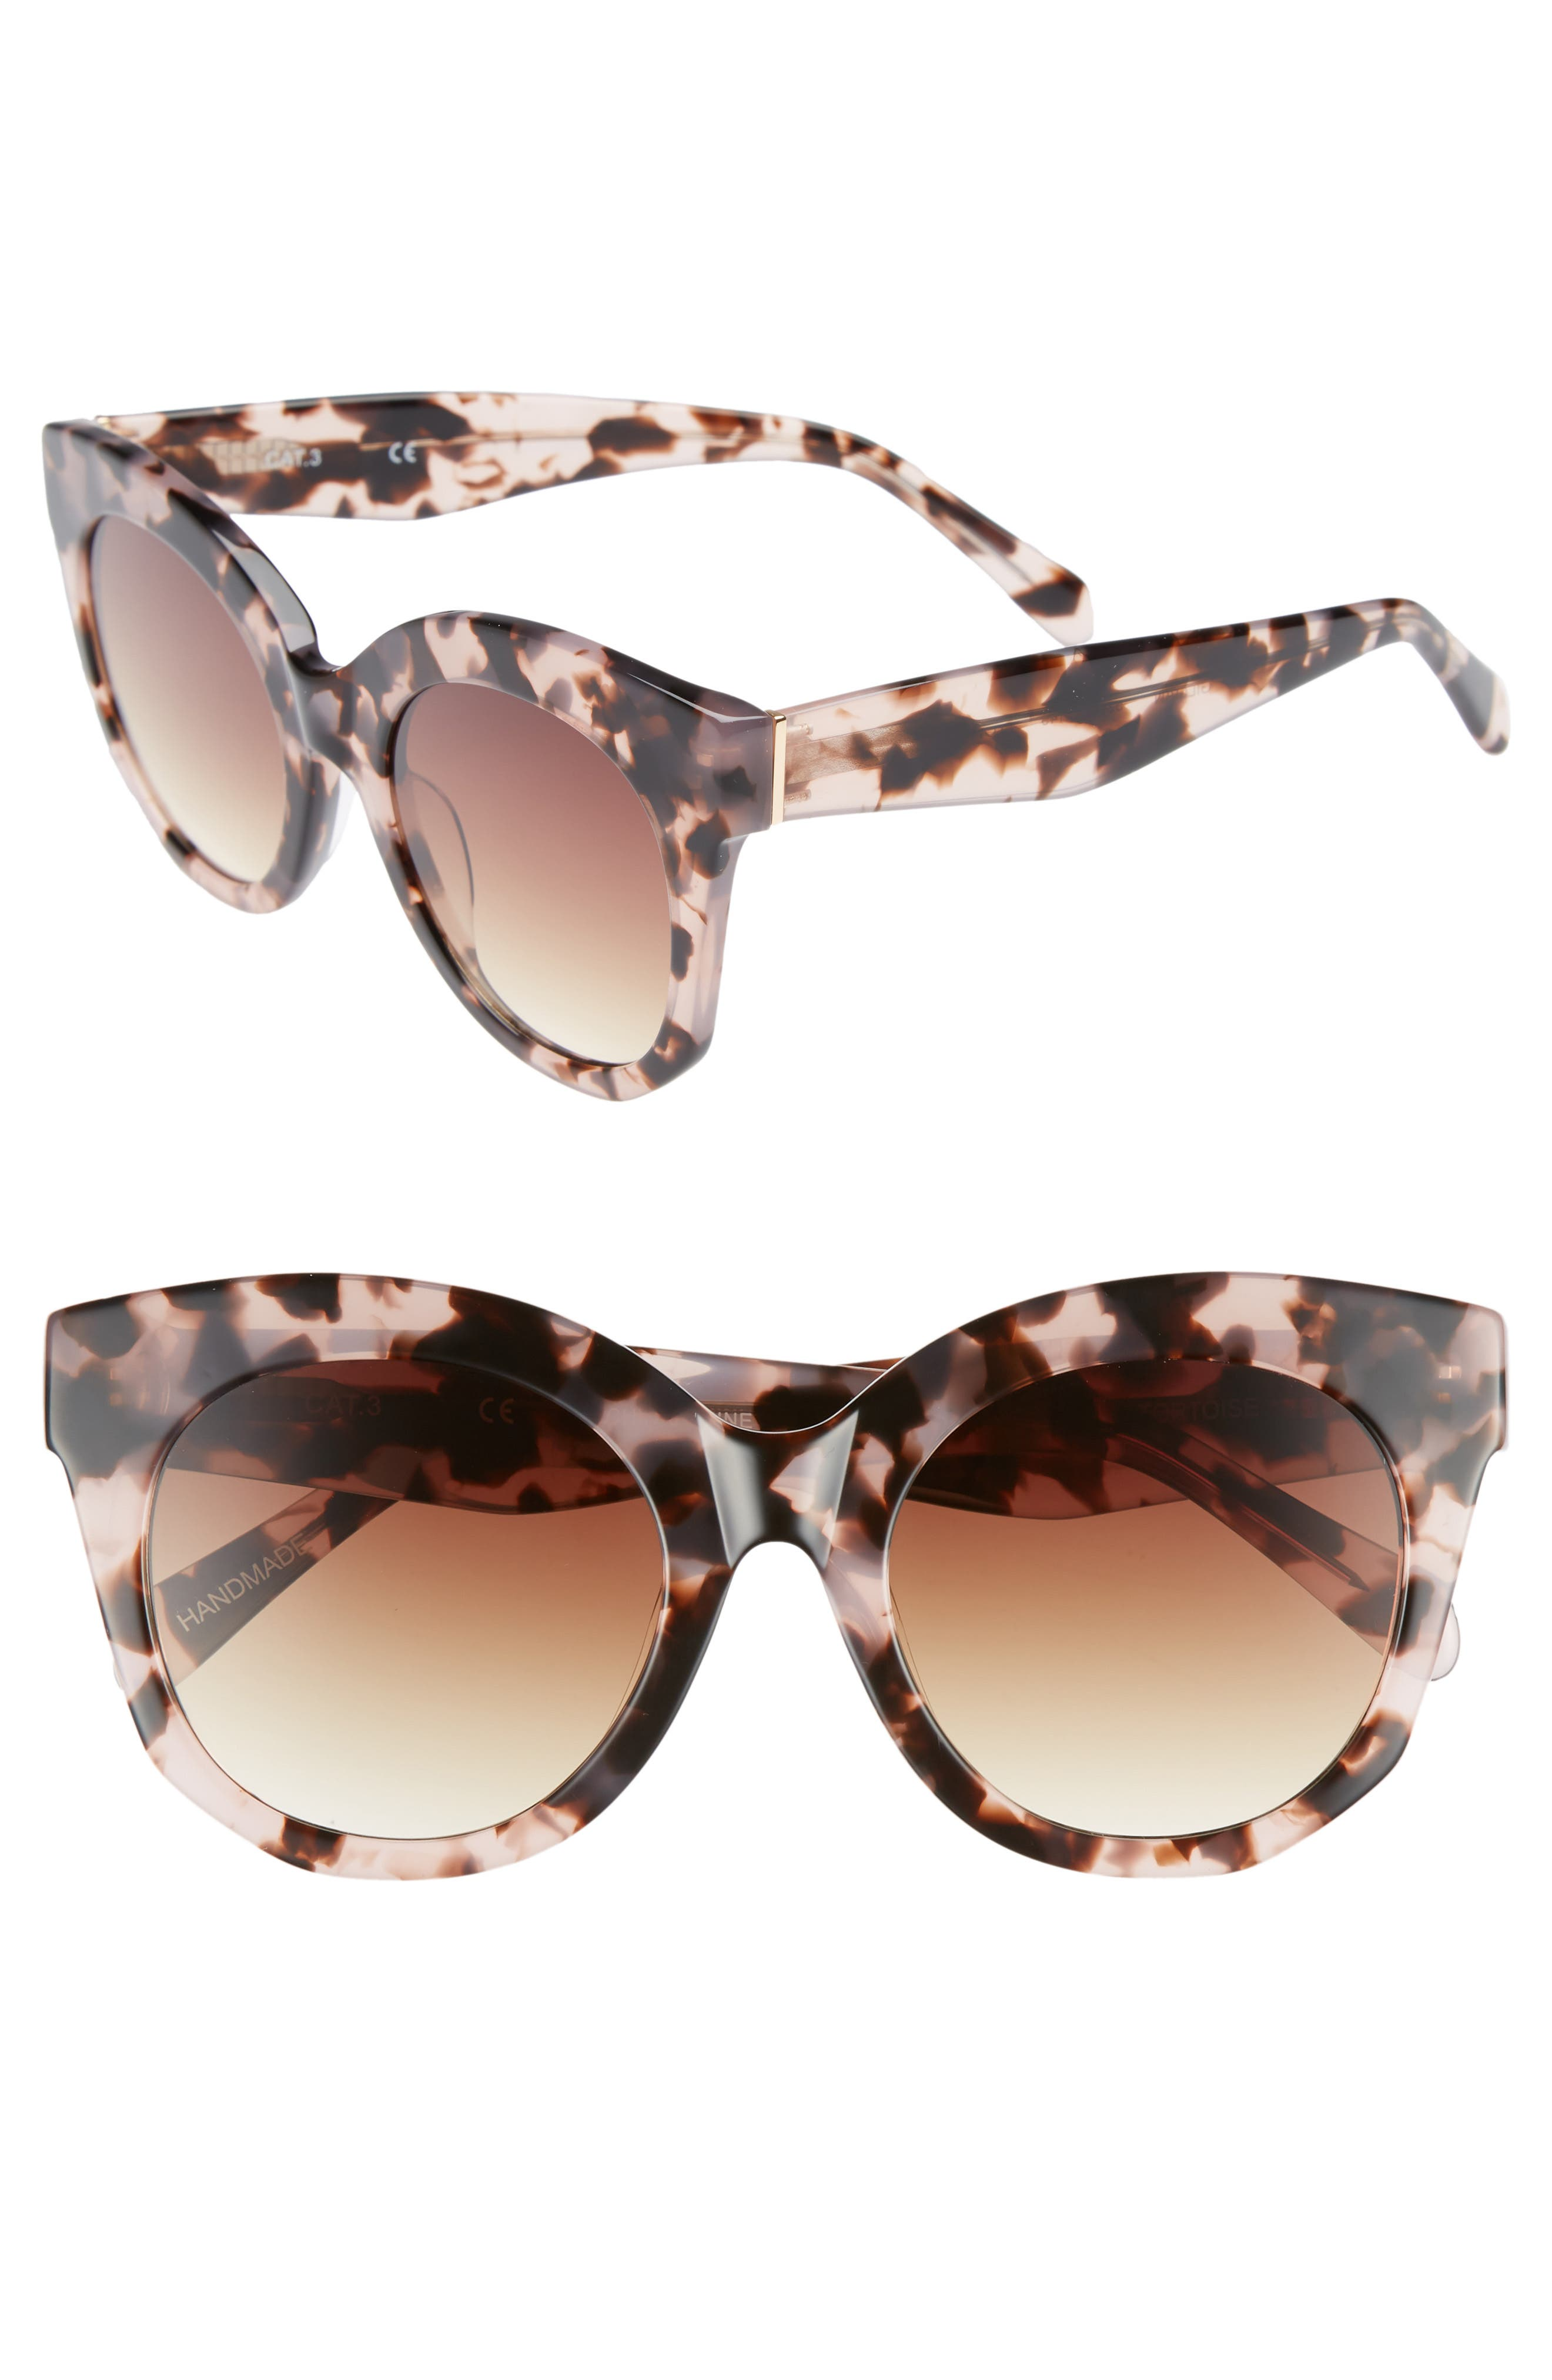 Gillian 52mm Sunglasses,                             Main thumbnail 1, color,                             650